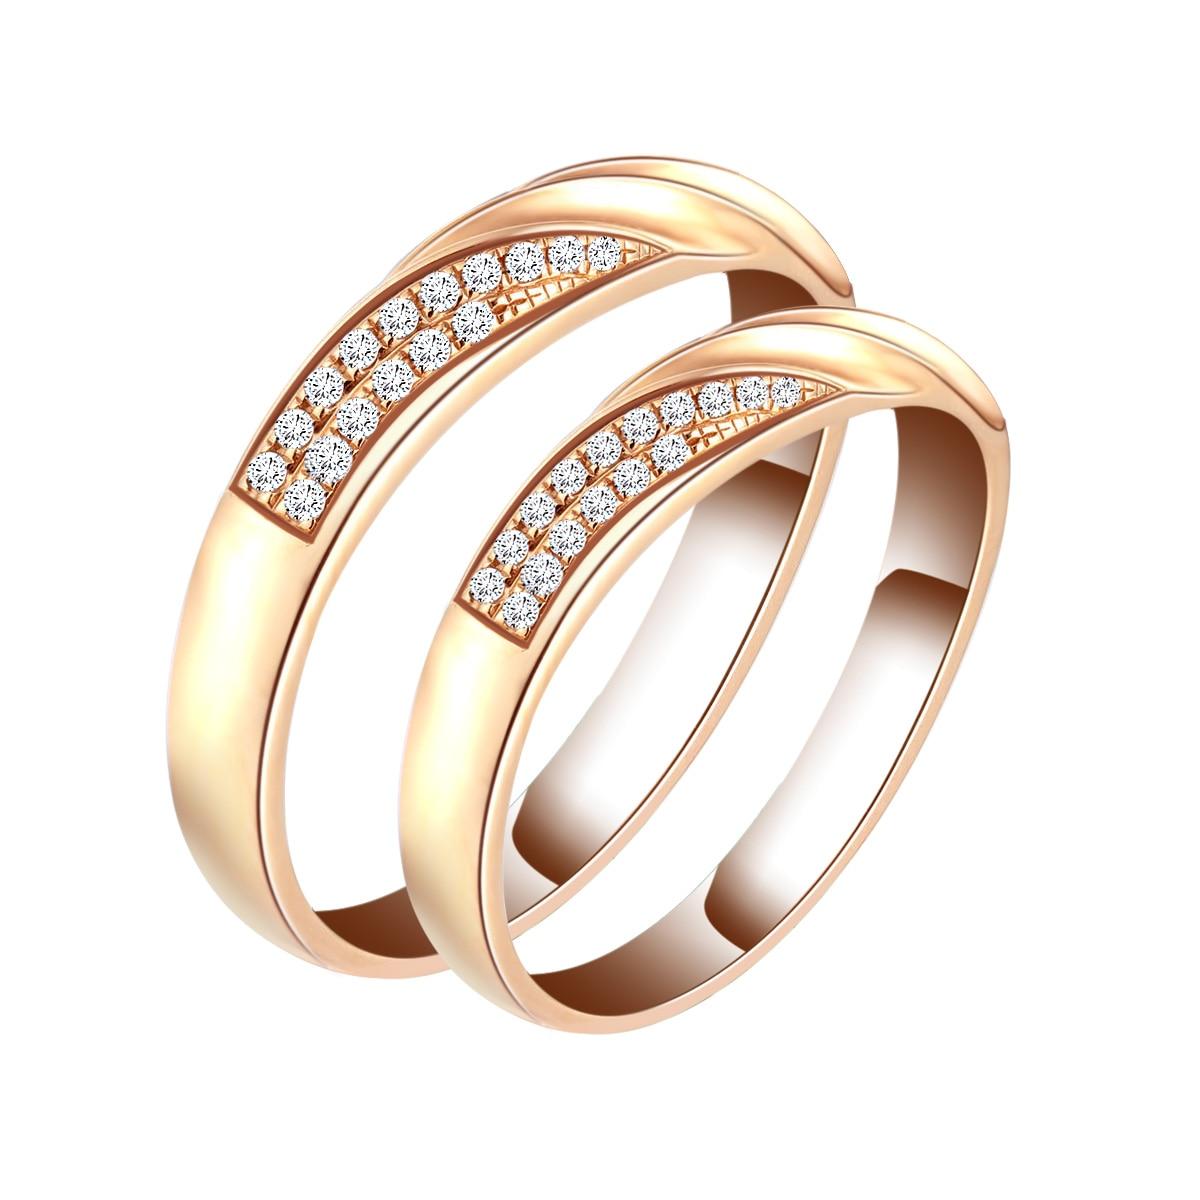 Genuine 18k White Gold Wedding Rings For Couples